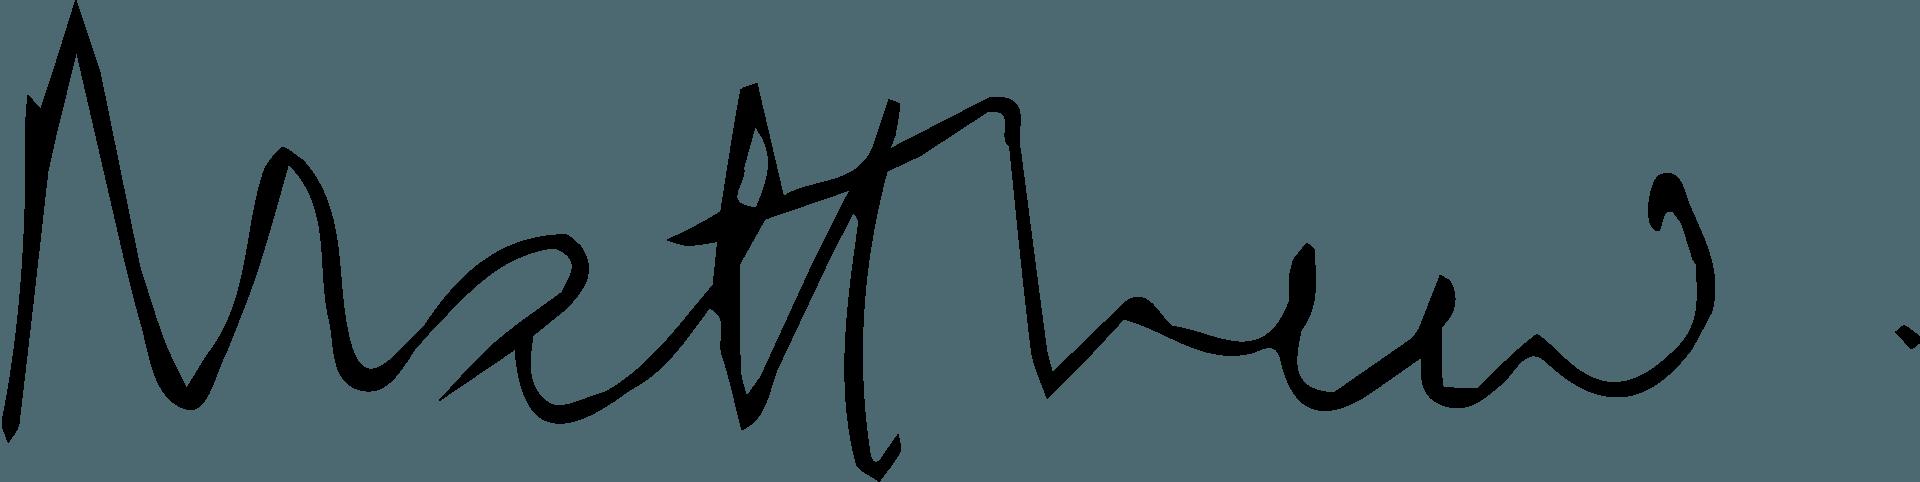 Matthew's signature